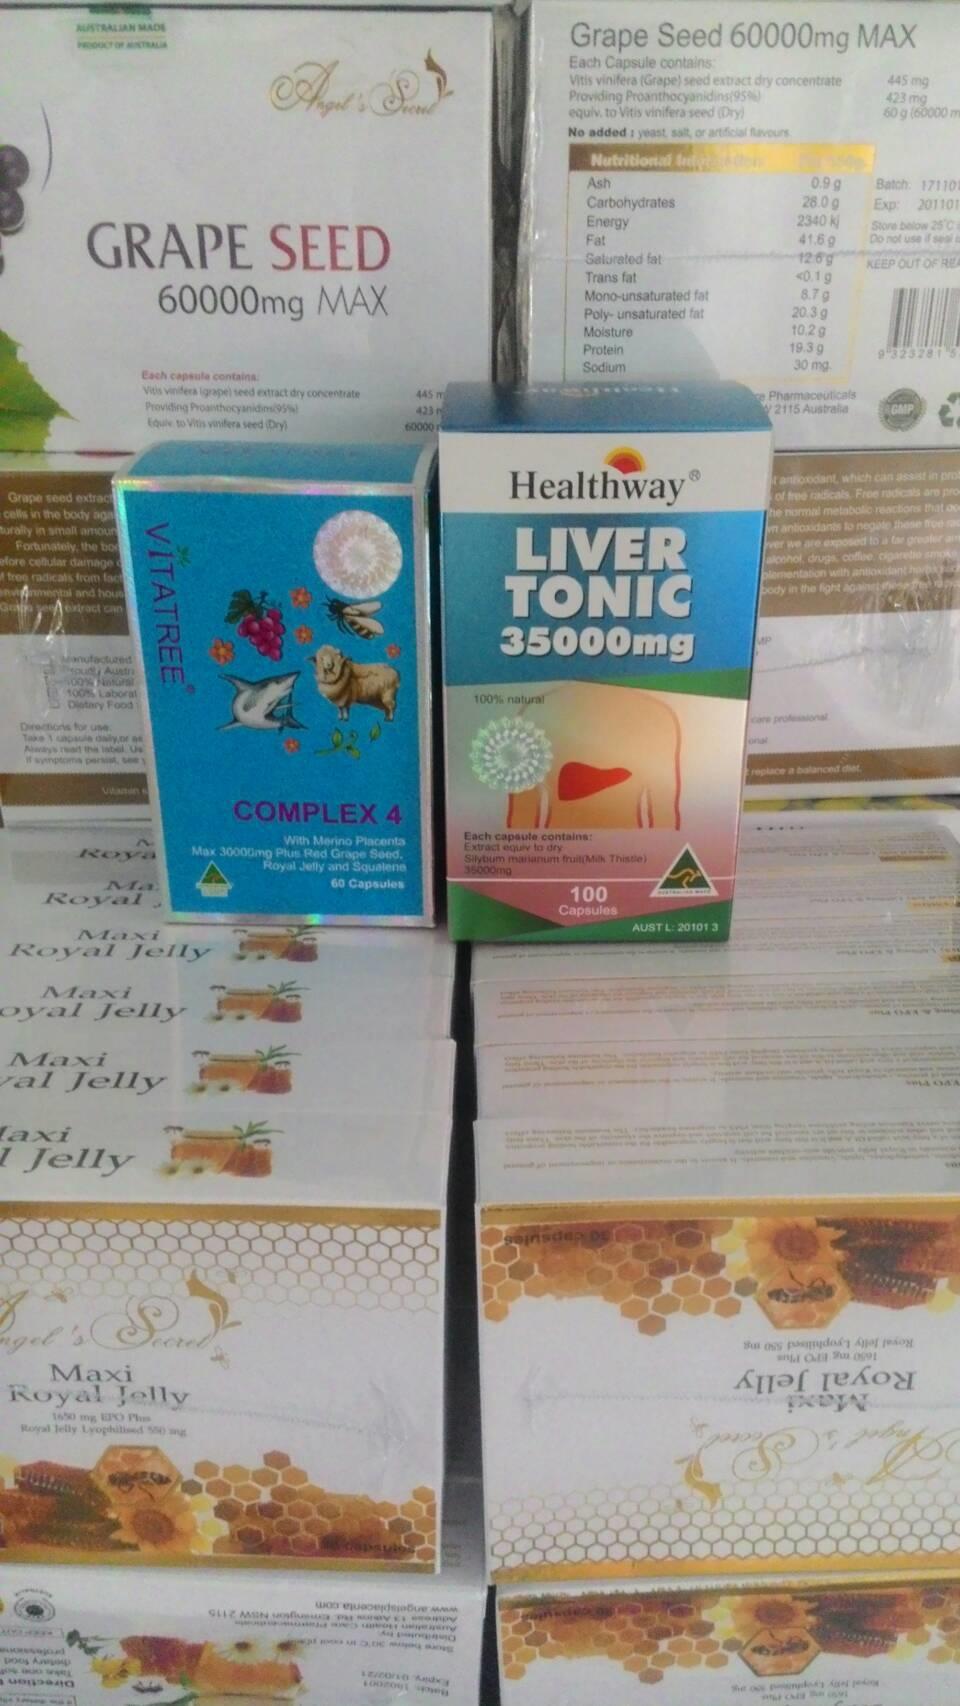 Vitatree 4 Complex 30 เม็ด + ดีท๊อกซ์ตับ healthway 35,000 mg. 30 เม็ด ขาวเนียน เด้ง เด็ก ครบจ้า